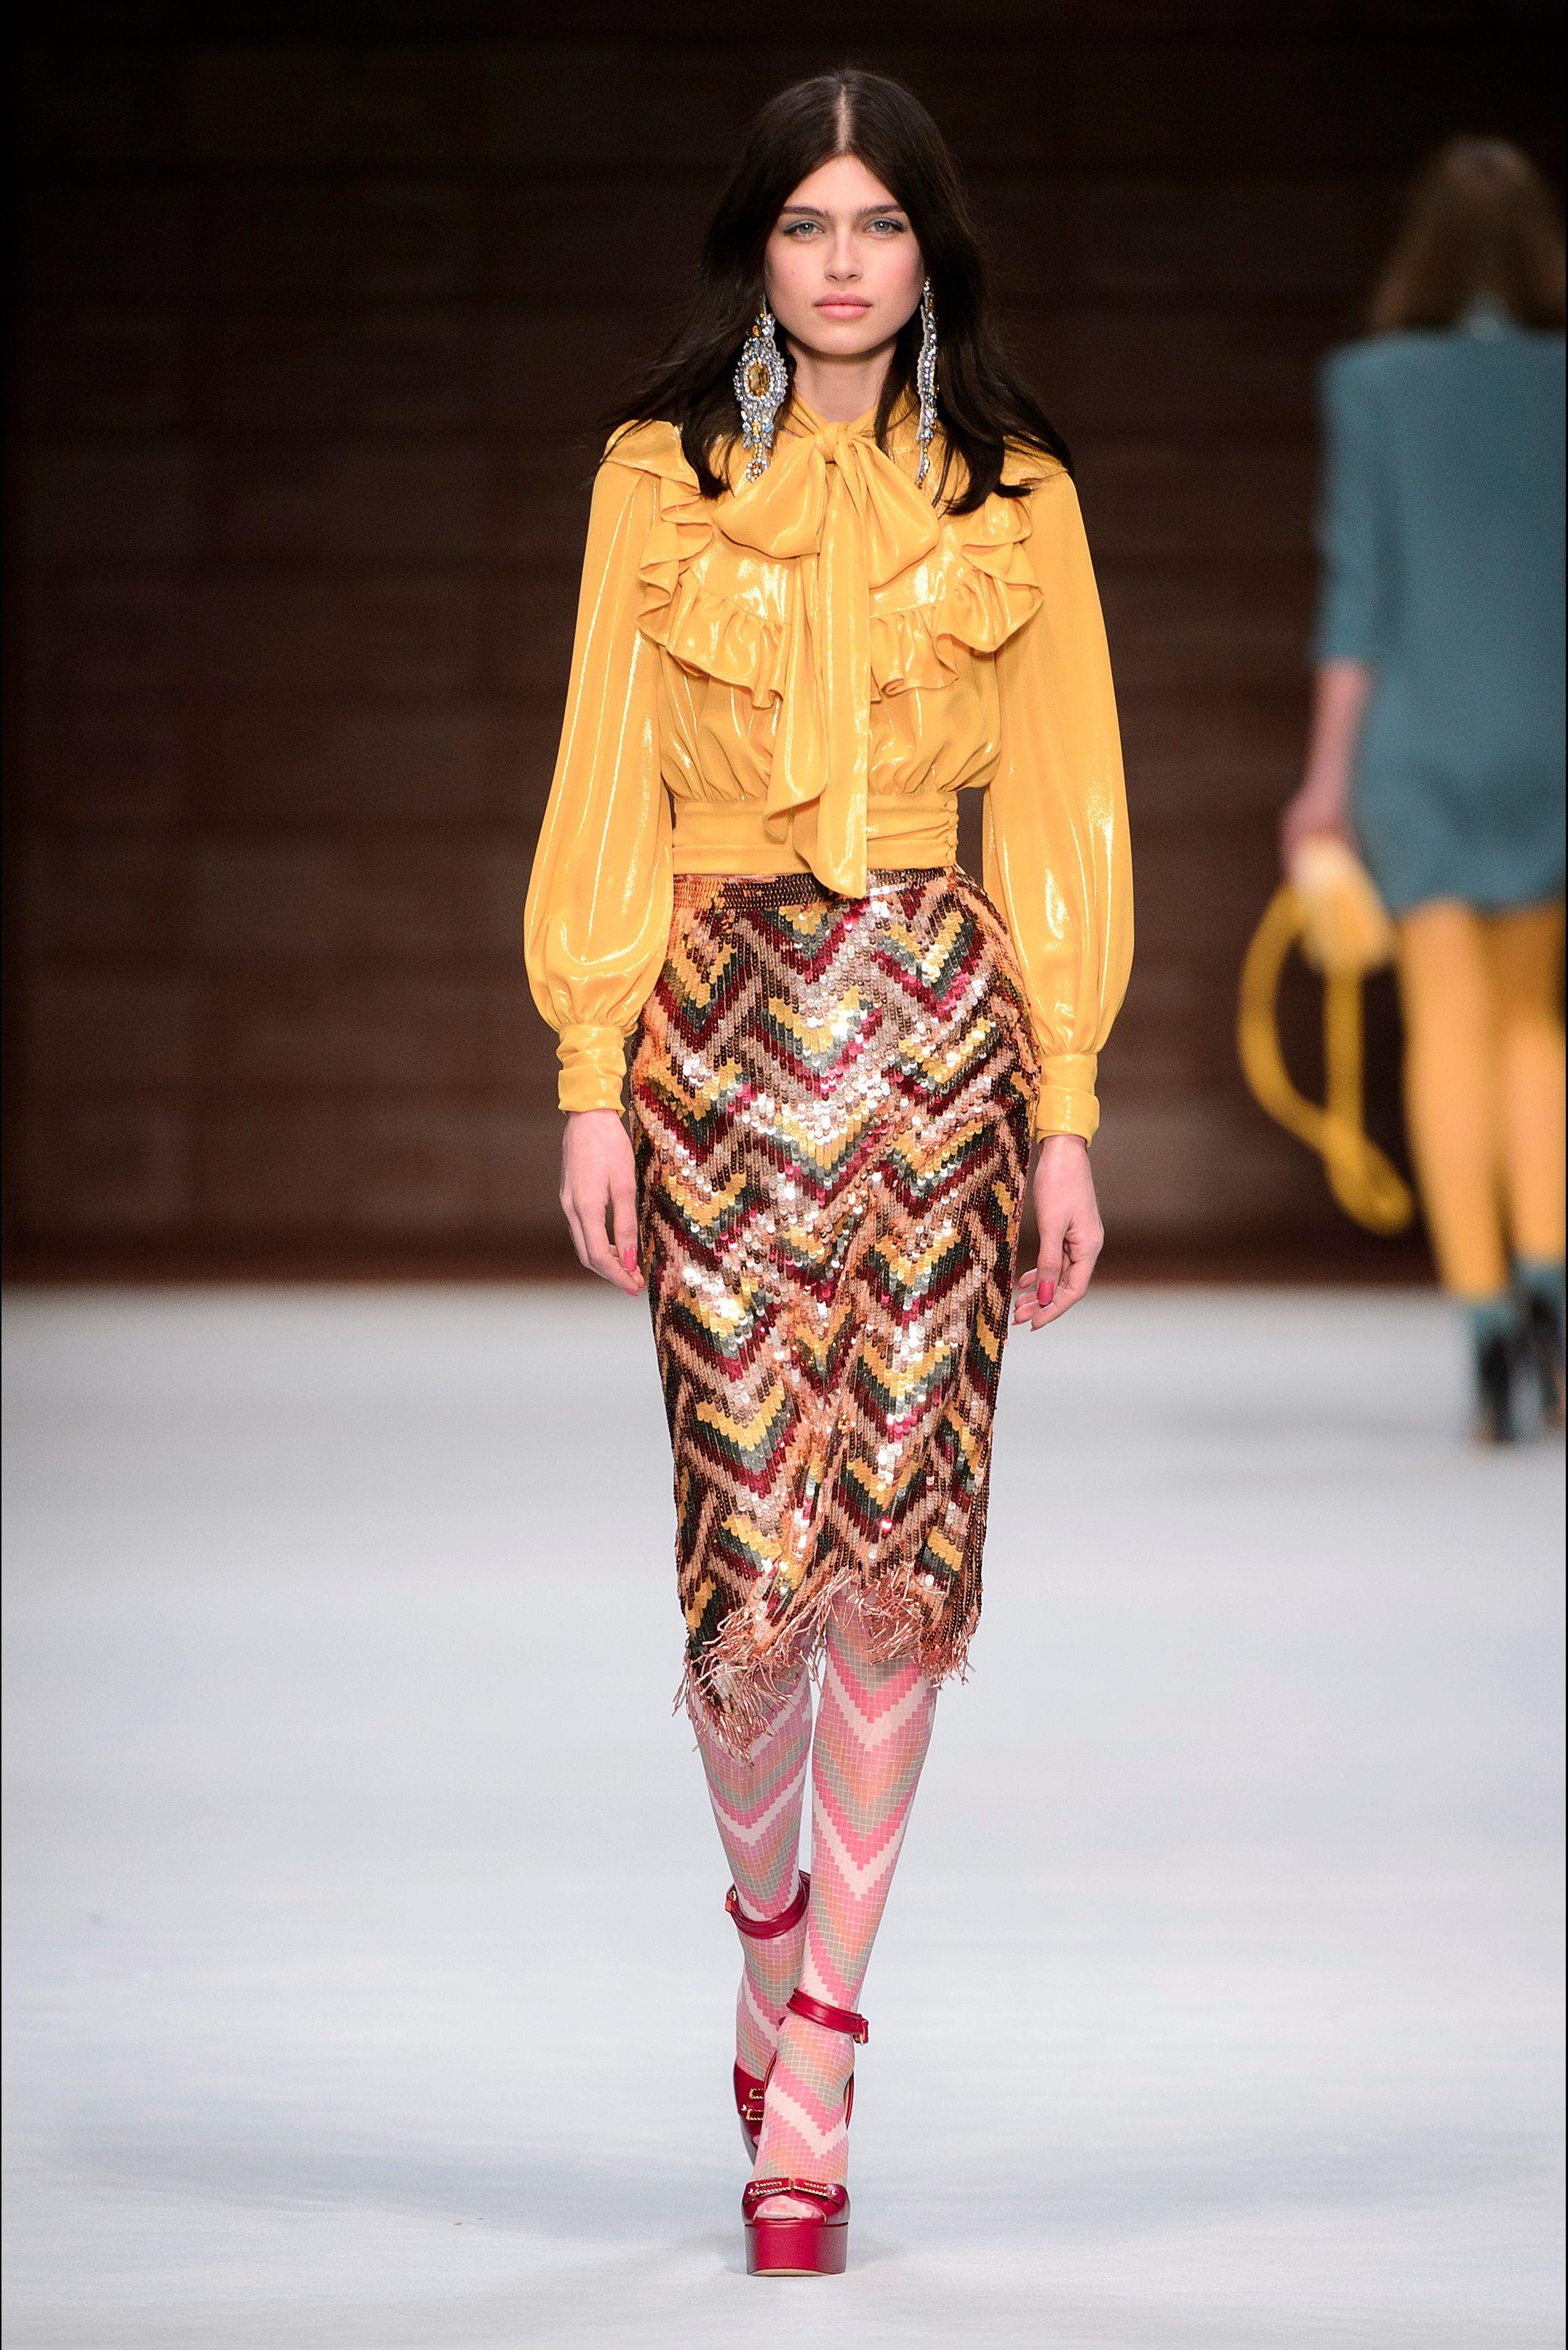 b22f1fd8594e7b Elisabetta Franchi Milano - Collections Fall Winter 2018-19 - Shows -  Vogue.it